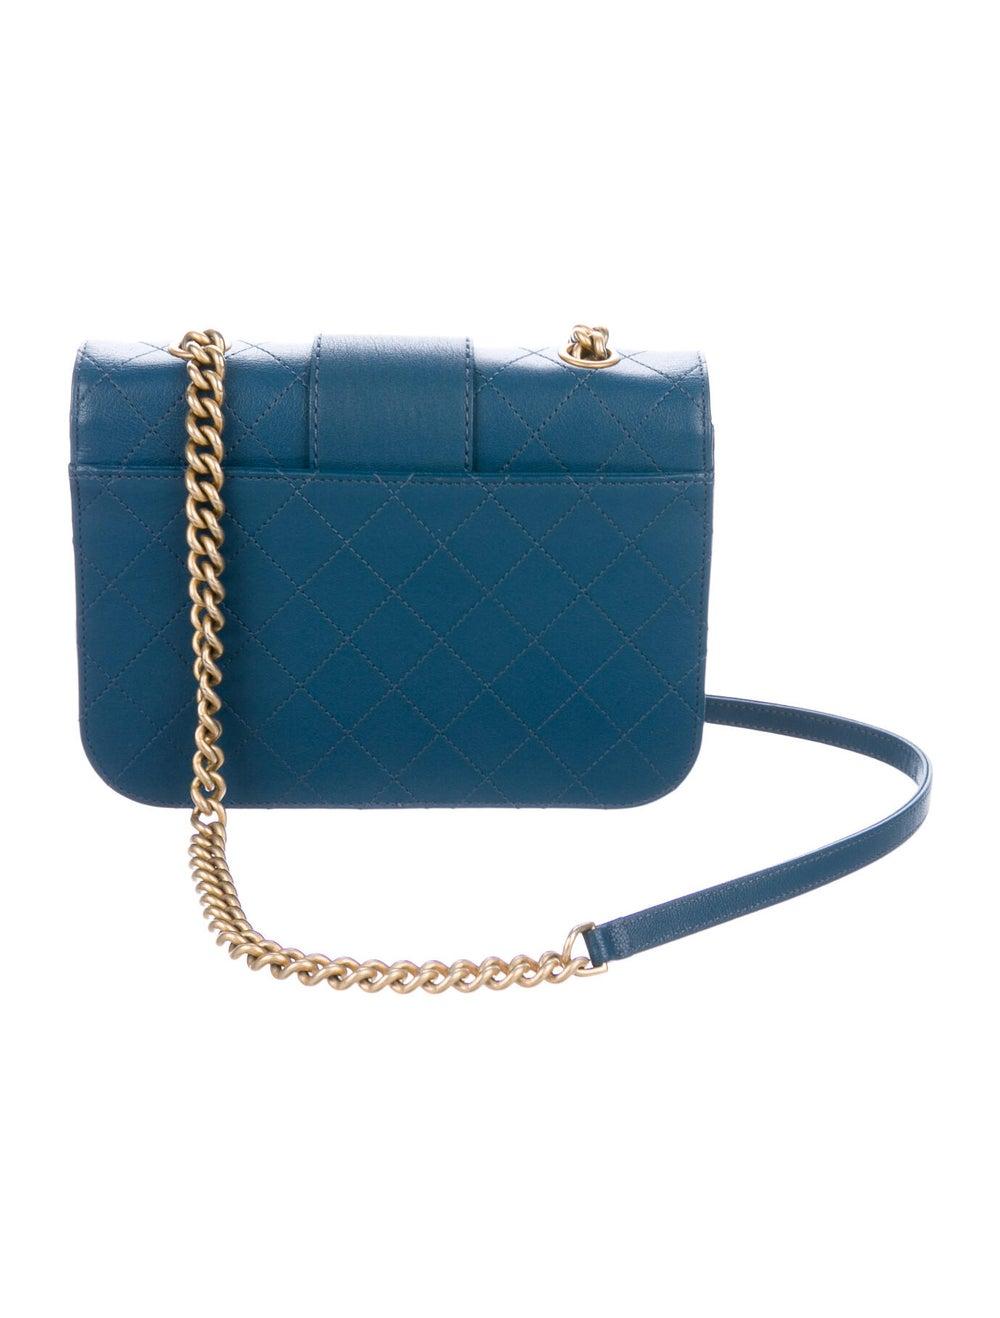 Chanel Front Chain Flap Bag Blue - image 4